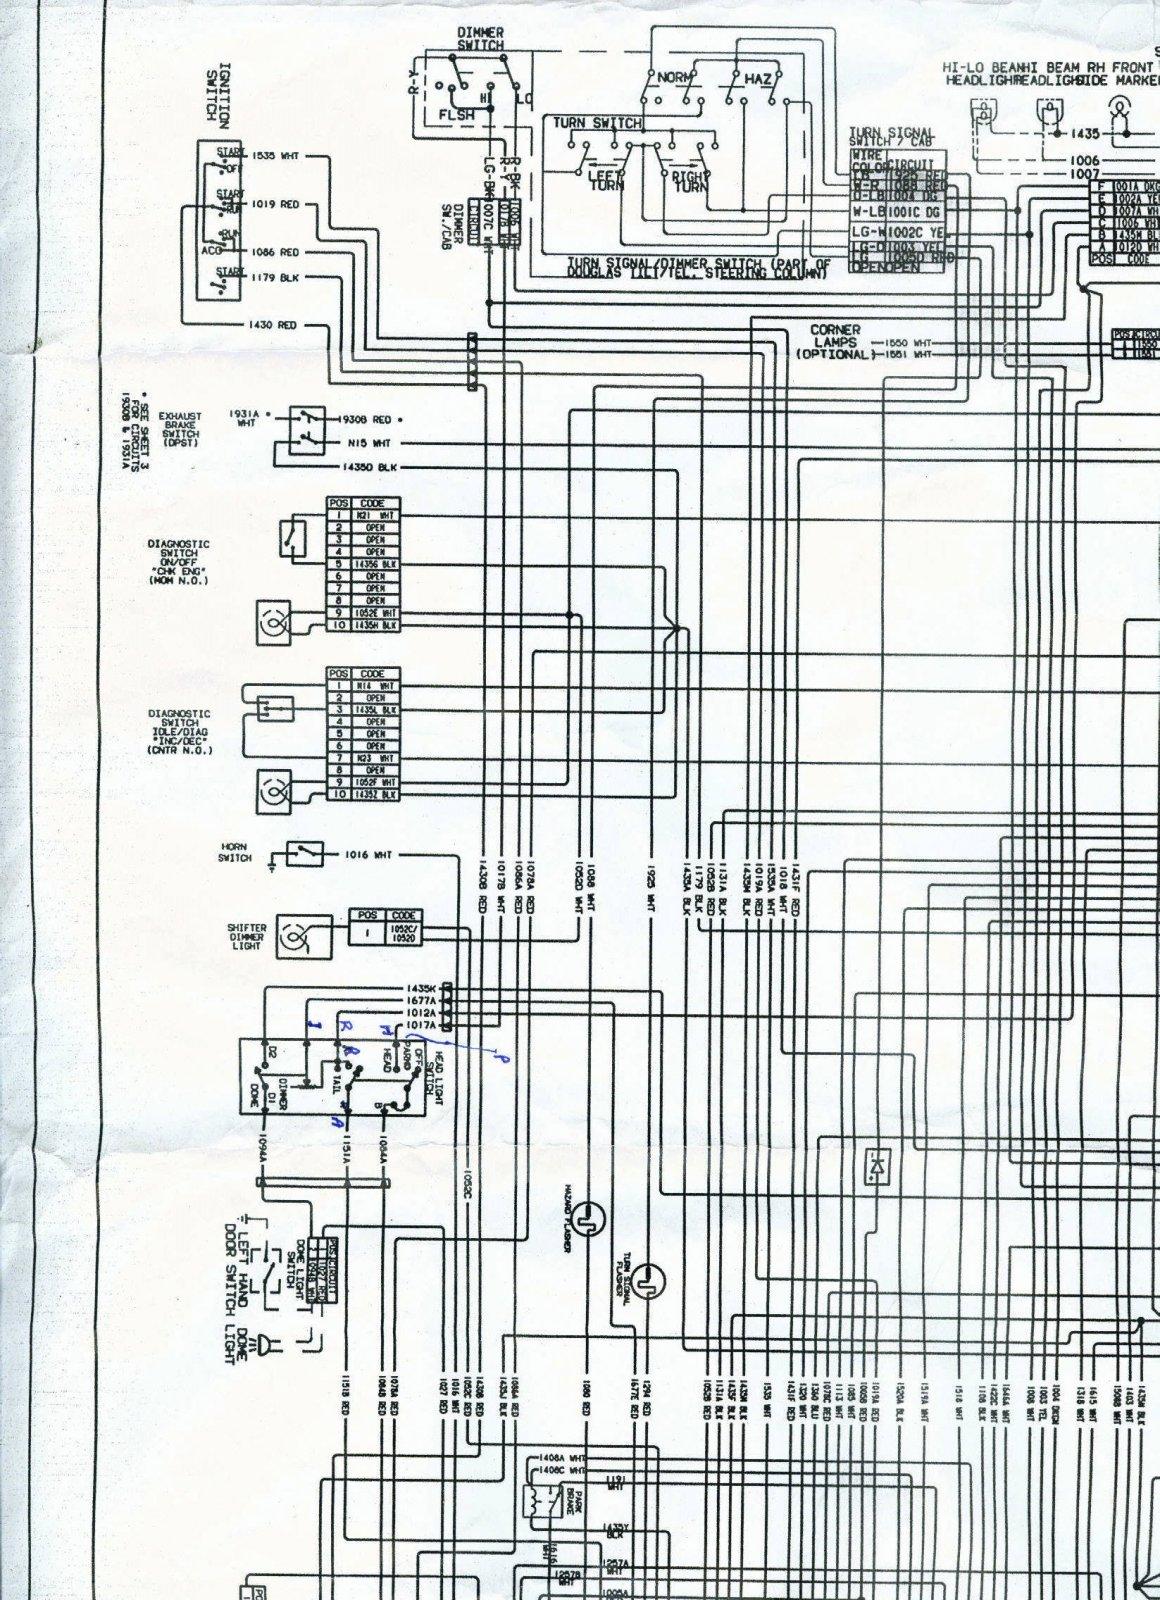 fleetwood wiring diagram motorhome fleetwood image diagram rv wiring southwind diagram auto wiring diagram schematic on fleetwood wiring diagram motorhome